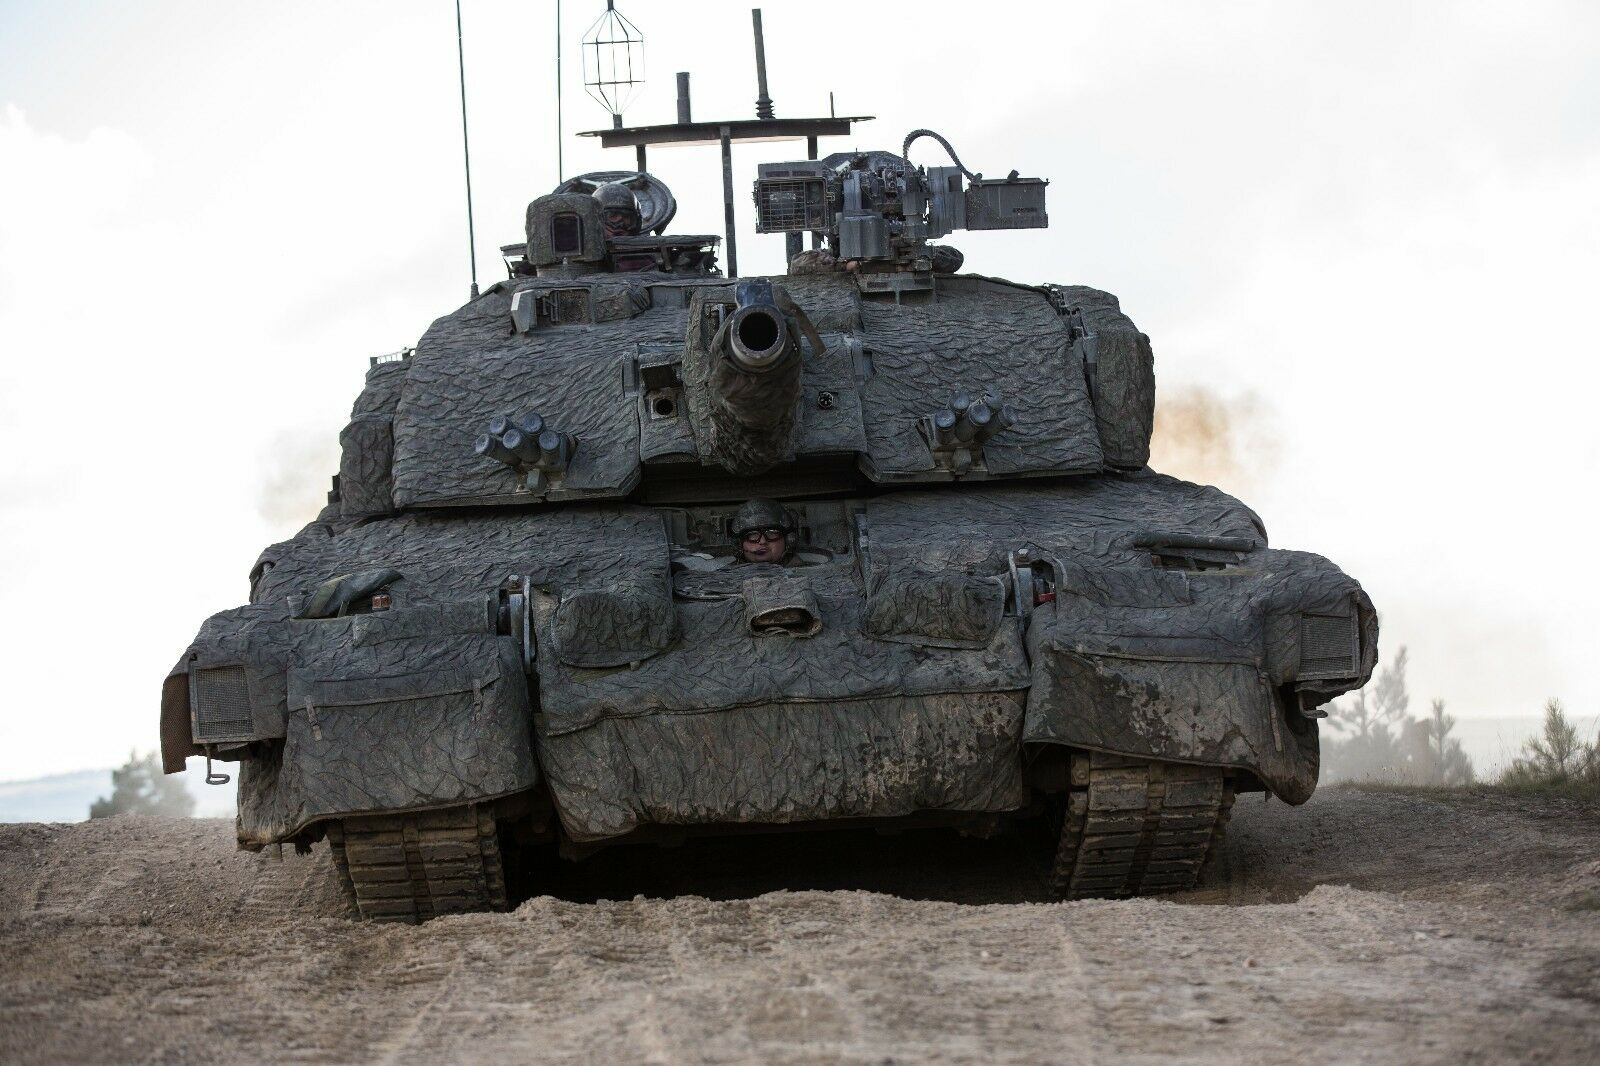 BRITISH ARMY CHALLENGER 2 MAIN BATTLE TANK  Photo Print